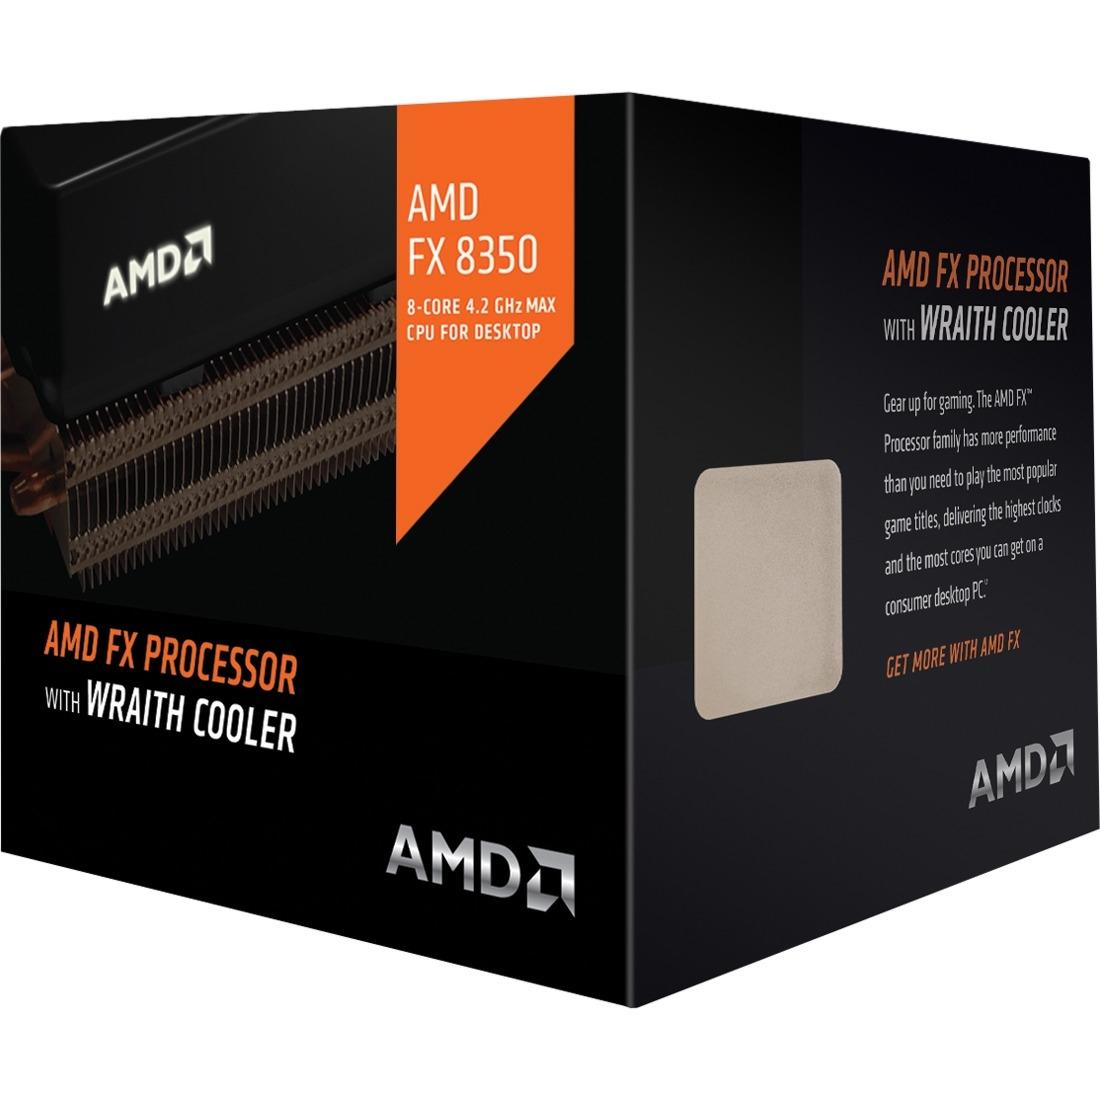 Octa-core FX-8350 4GHz Desktop Black Edition Processor